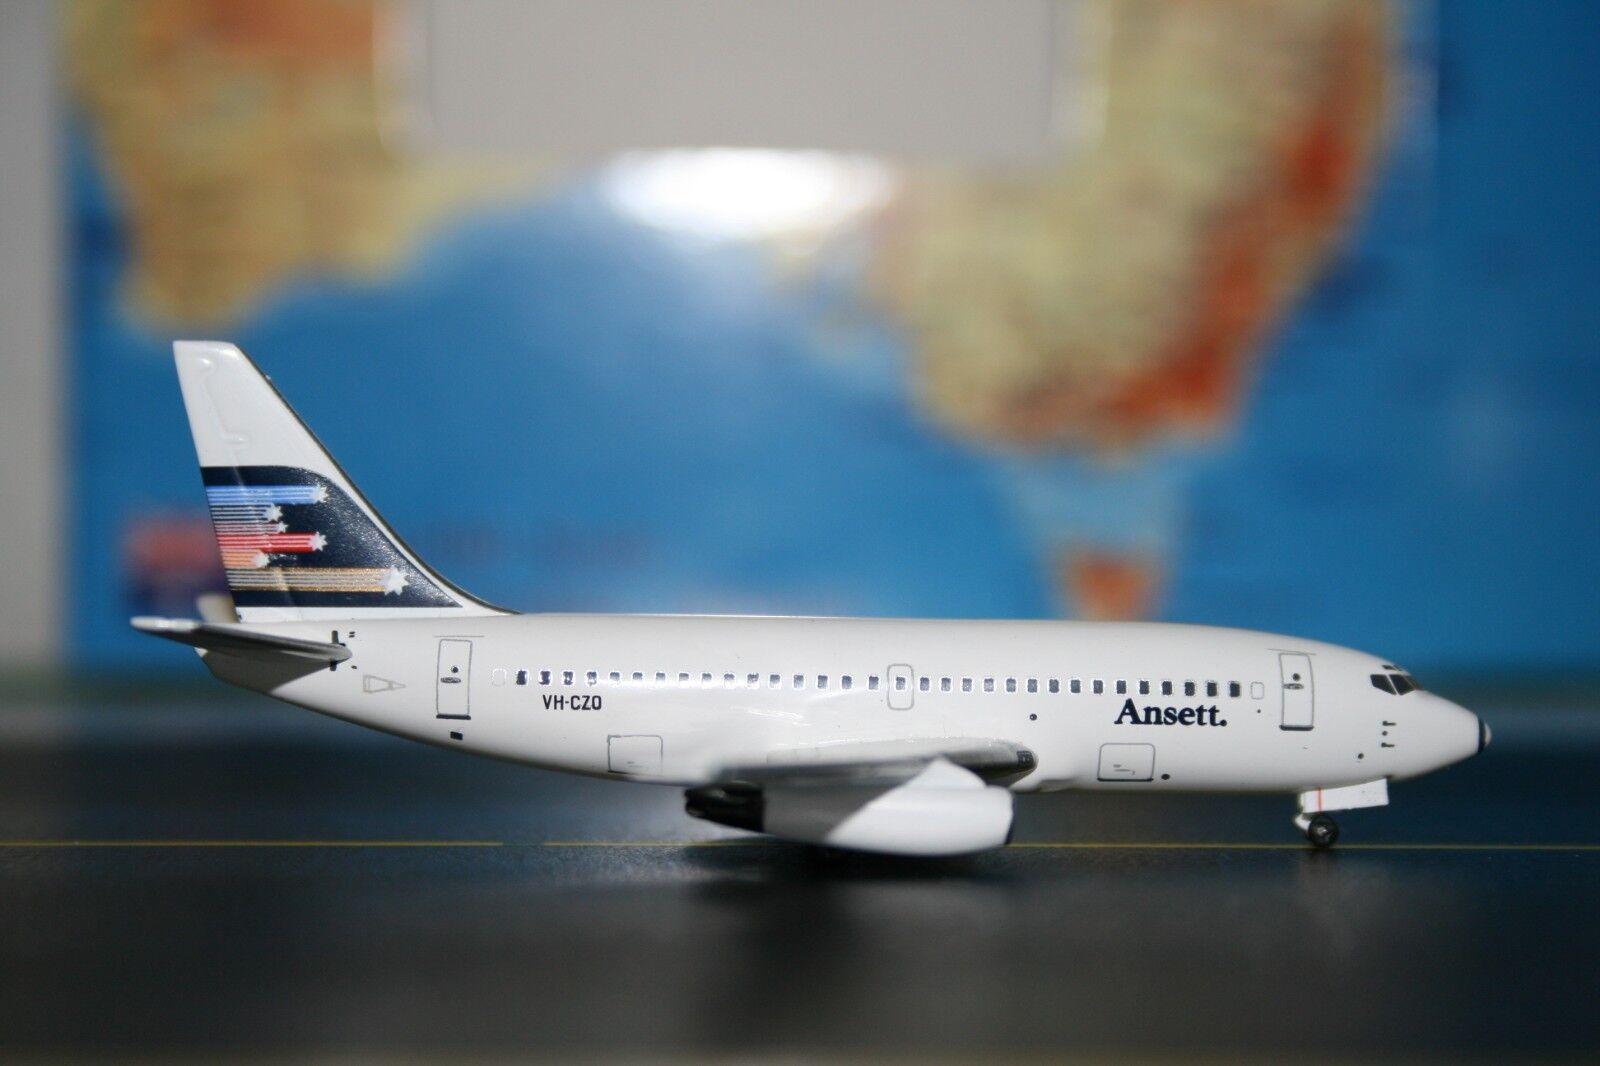 Aeroclassics 1 400 Ansett Boeing 737-200 VH-CZO (ACVHCZO) Die-Cast Model Plane